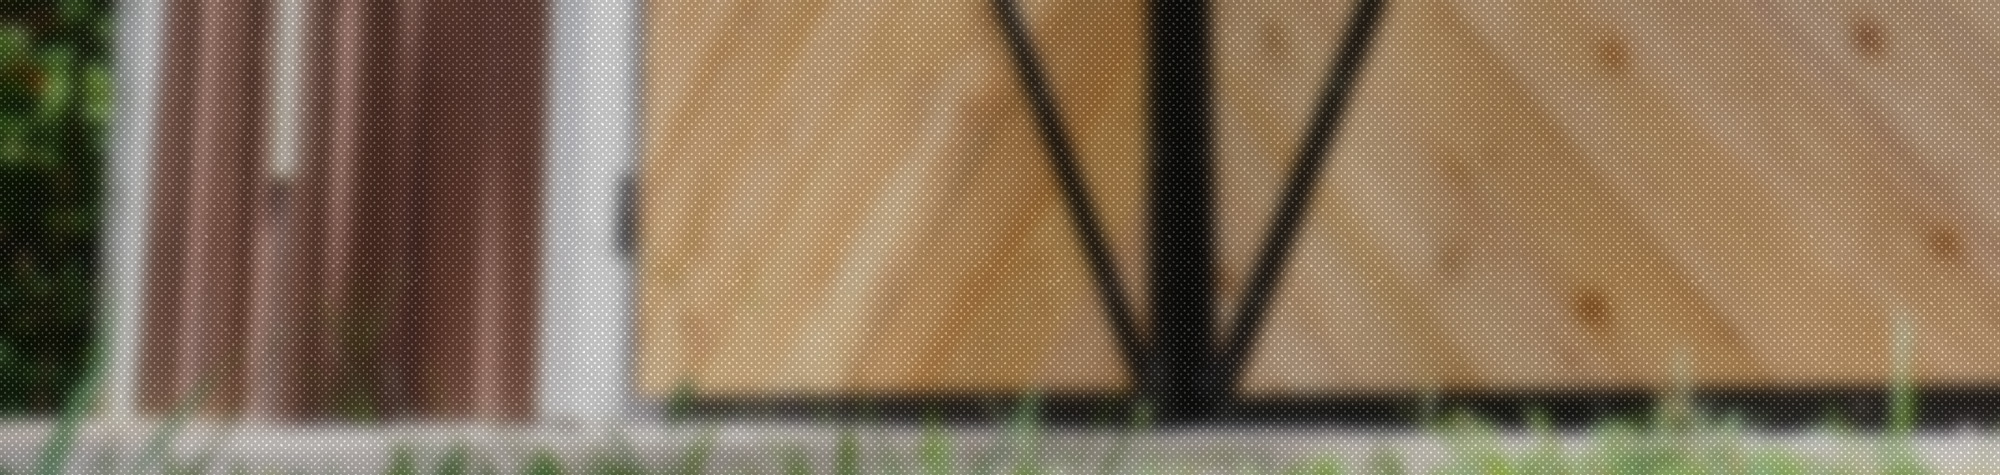 How to Make Barn Doors